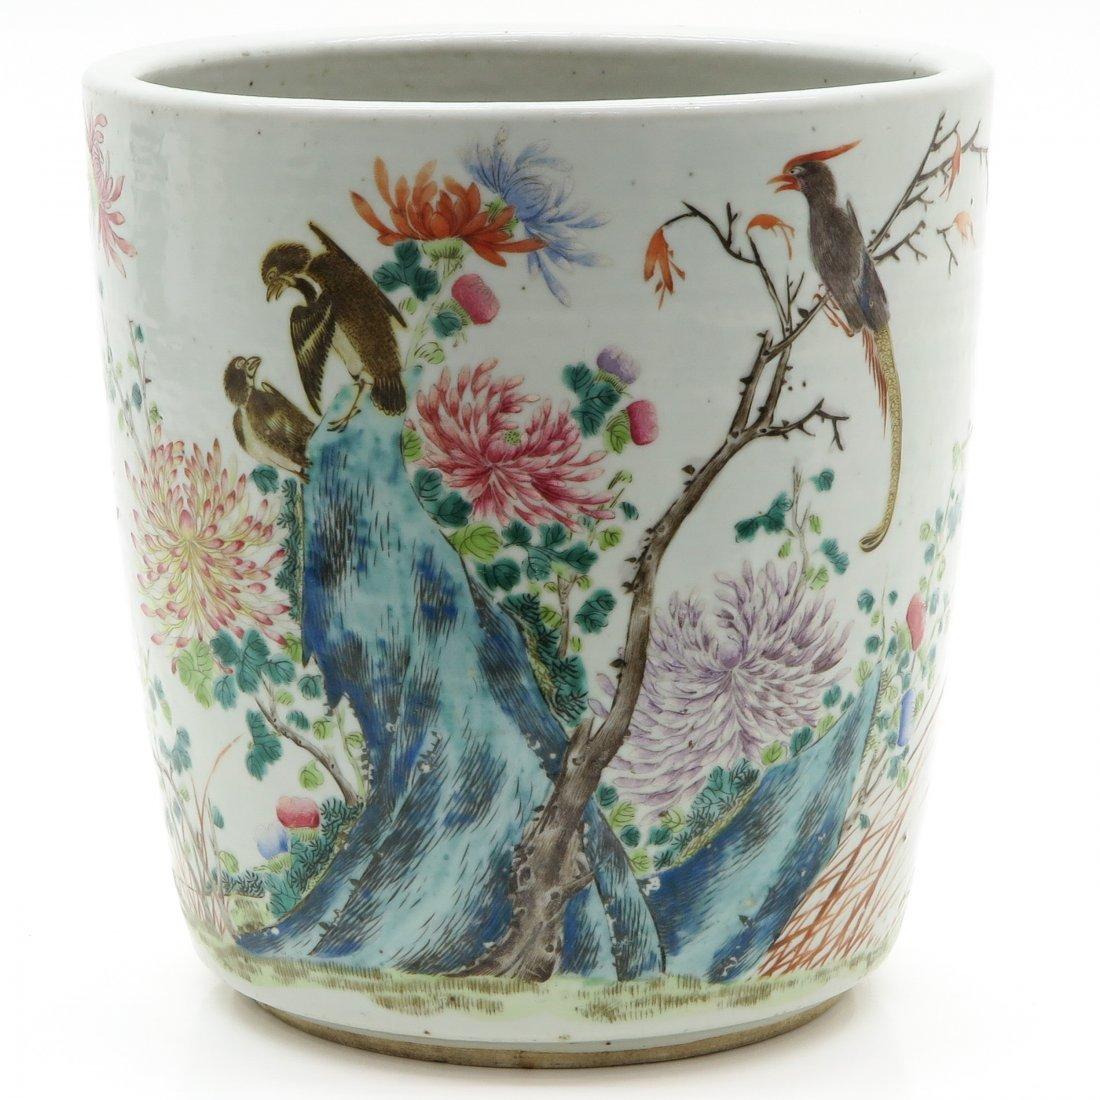 19th Century China Porcelain Famille Rose Cache Pot